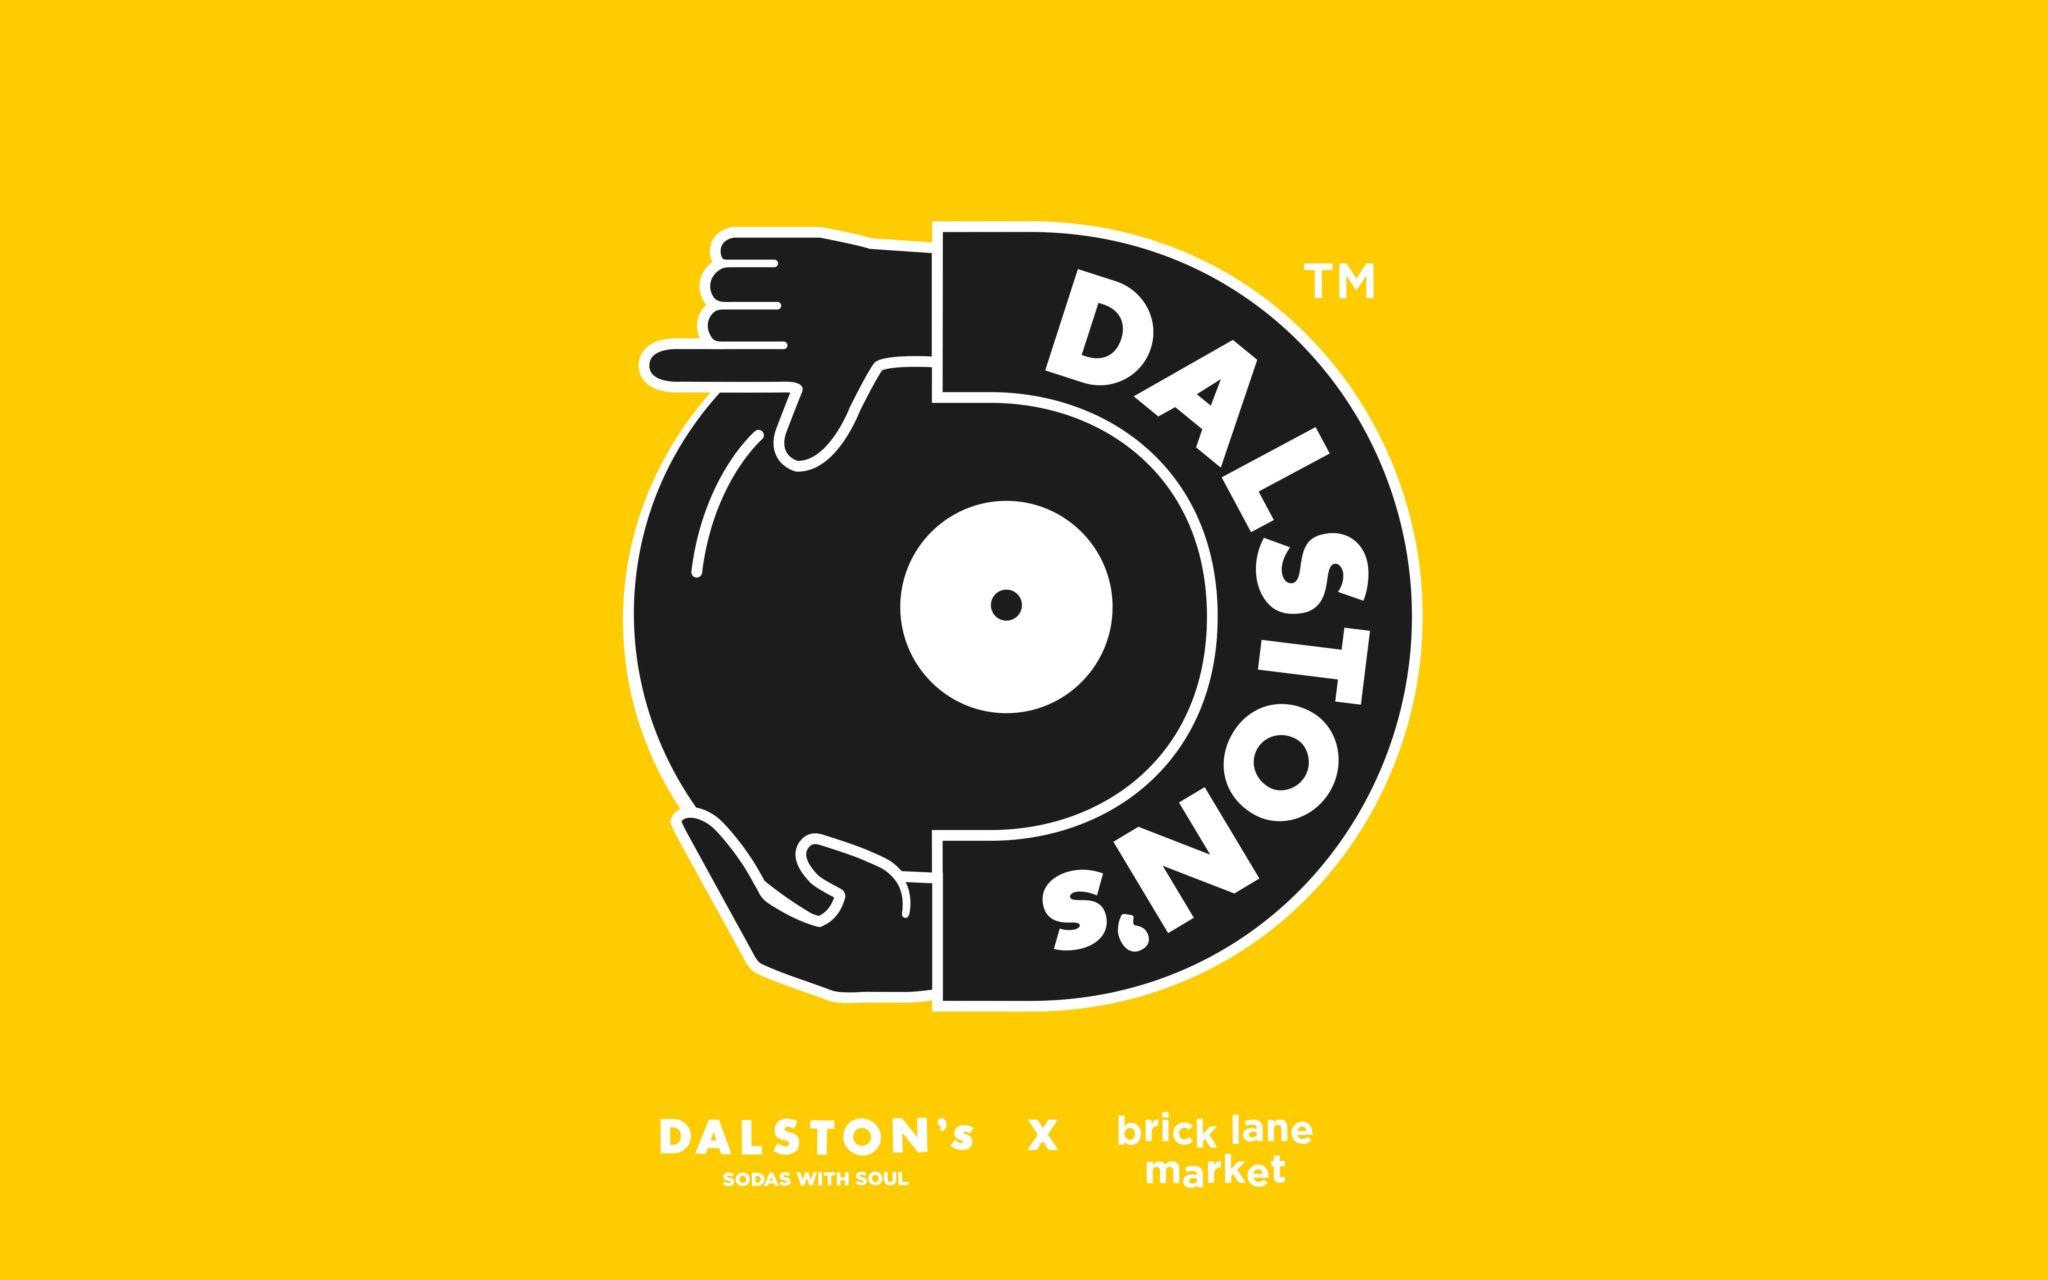 Amelia Cherril's re-imagined logo for Dalston's